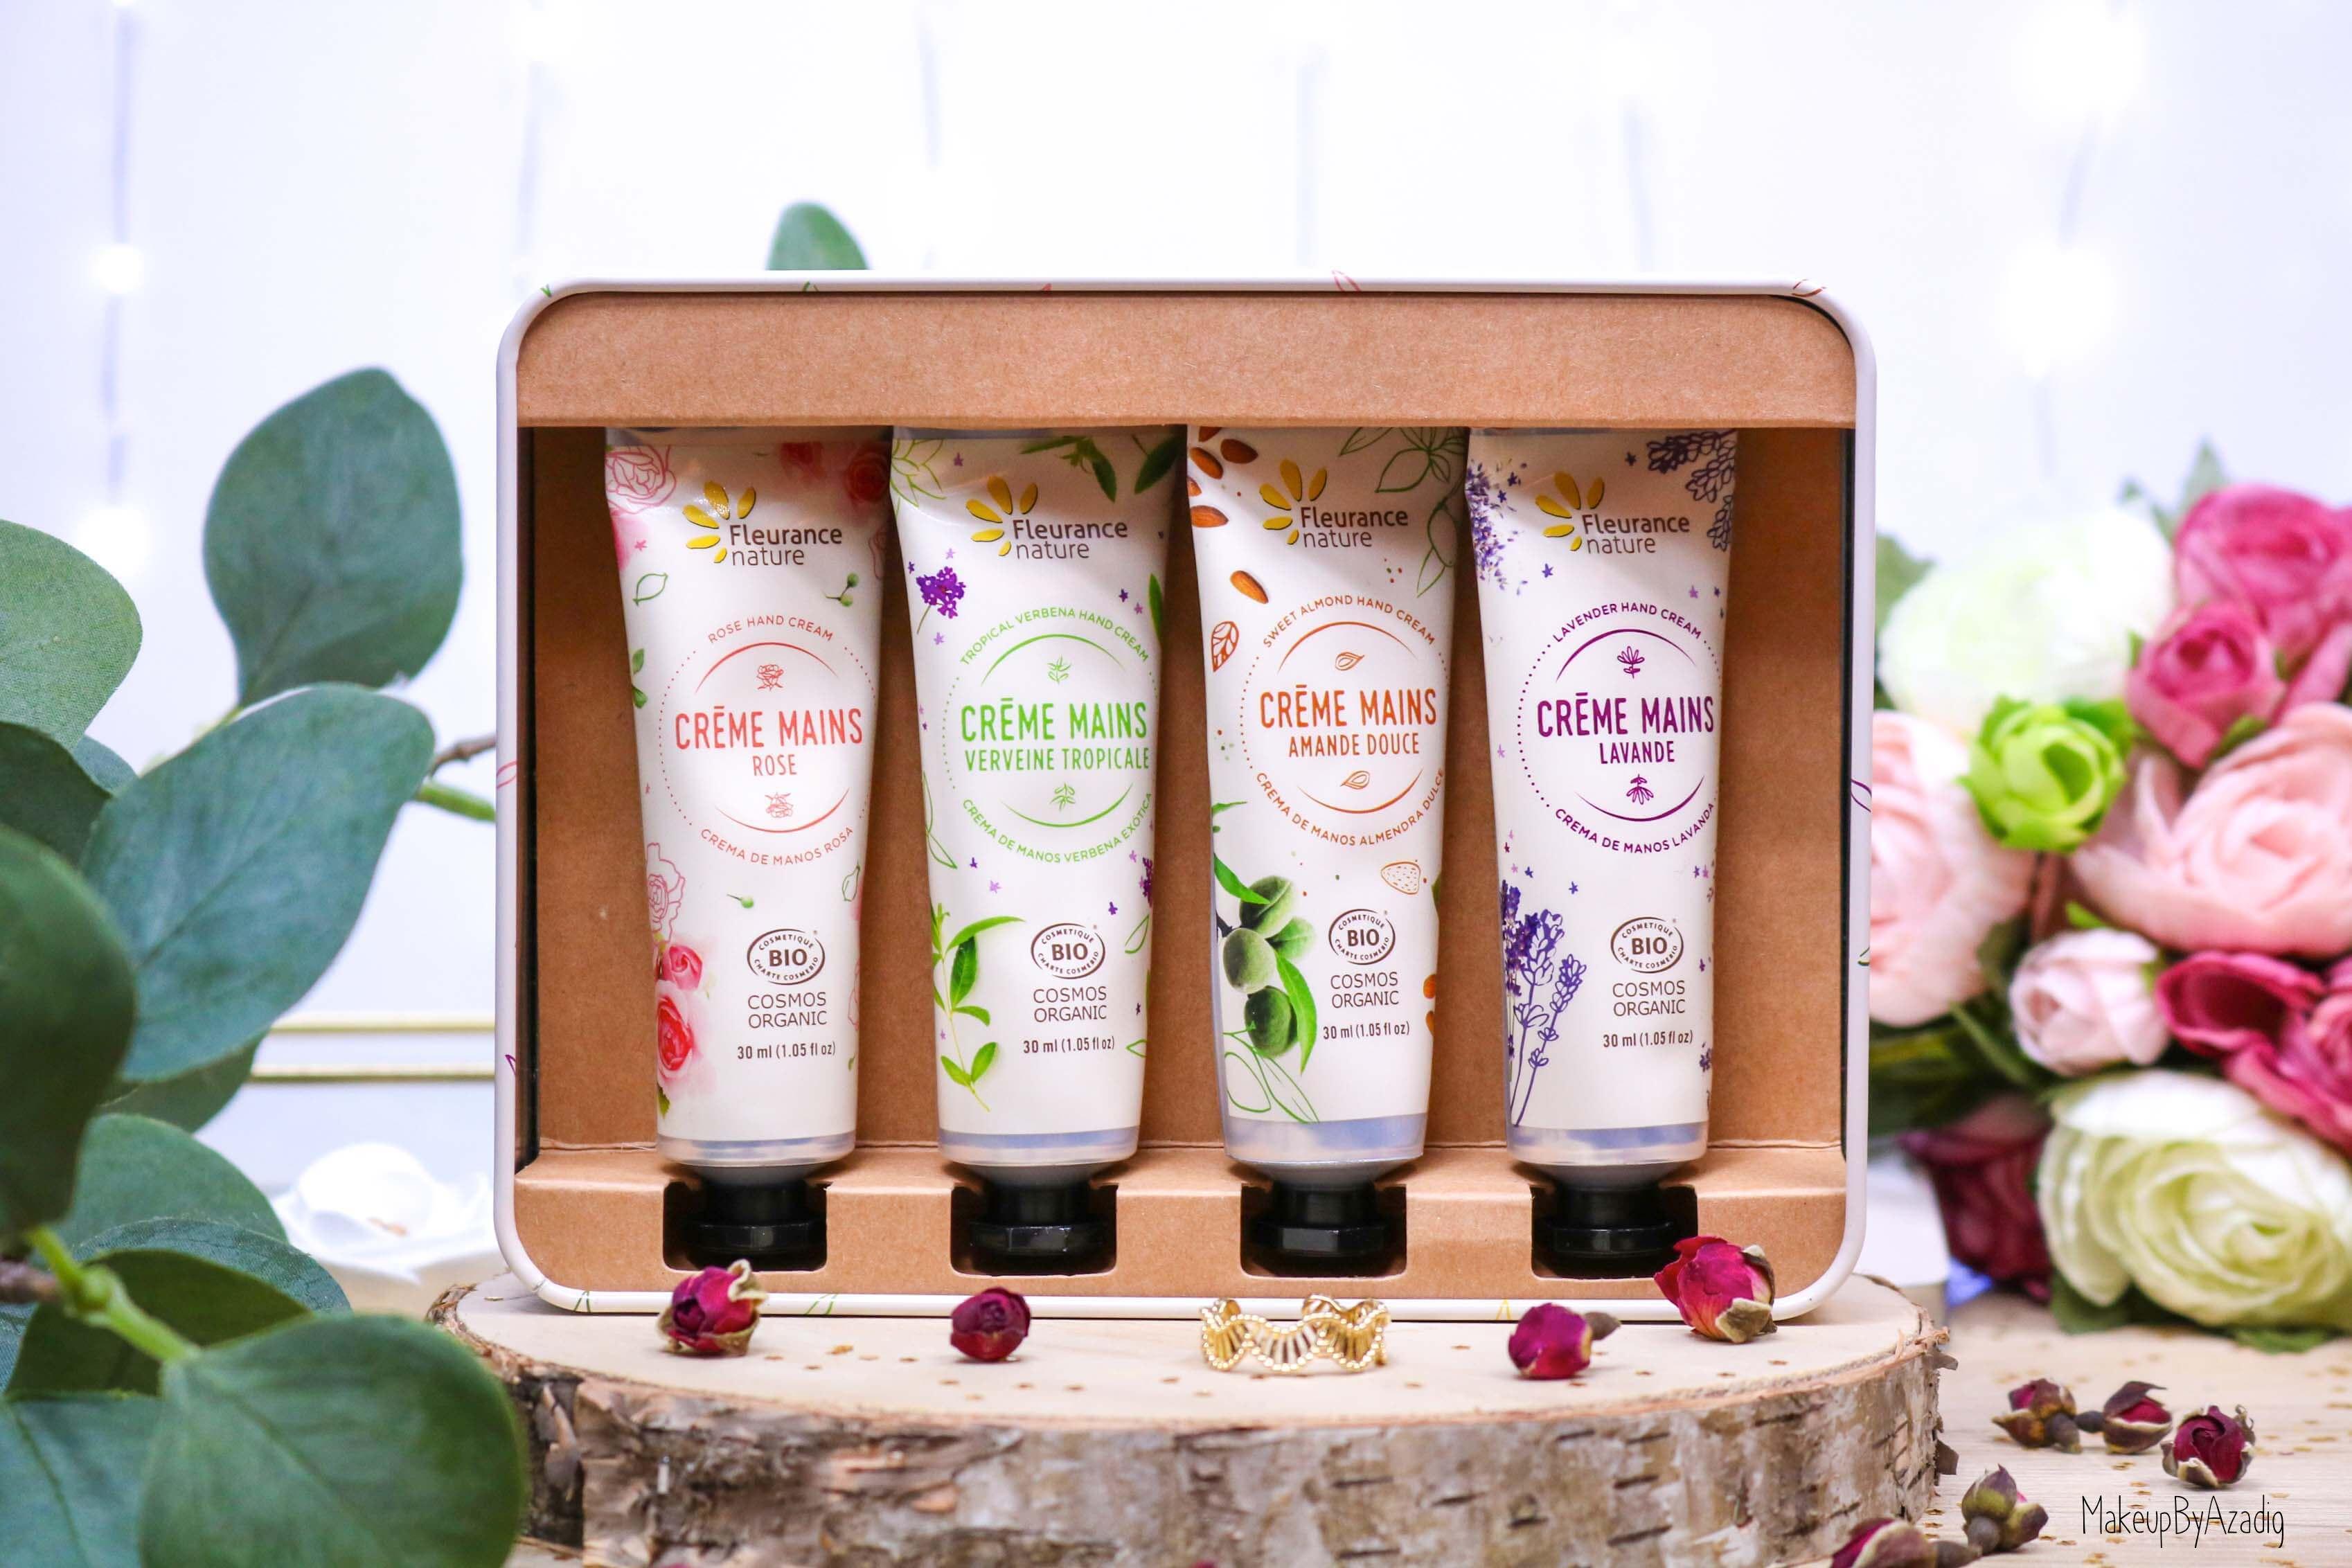 revue-creme-hydratante-reparatrice-mains-hand-bio-beaute-fleurance-nature-makeupbyazadig-verveine-lavande-rose-amande-coffret